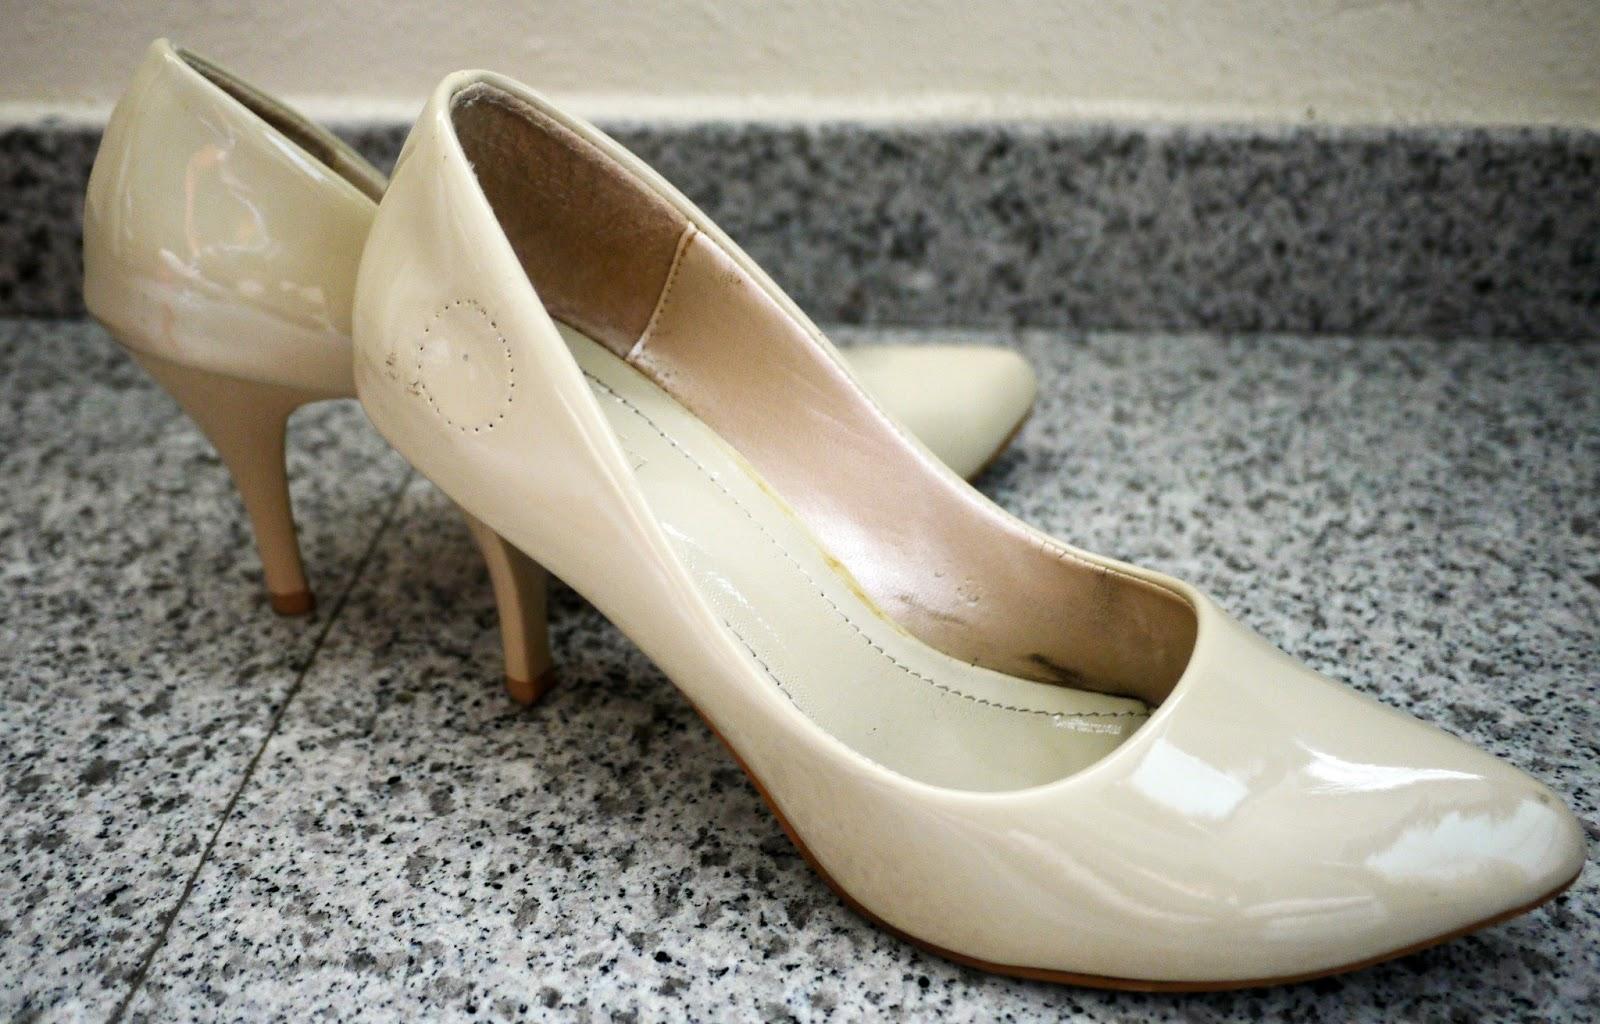 My Solitaire Wedding Wedding Shoes DIY